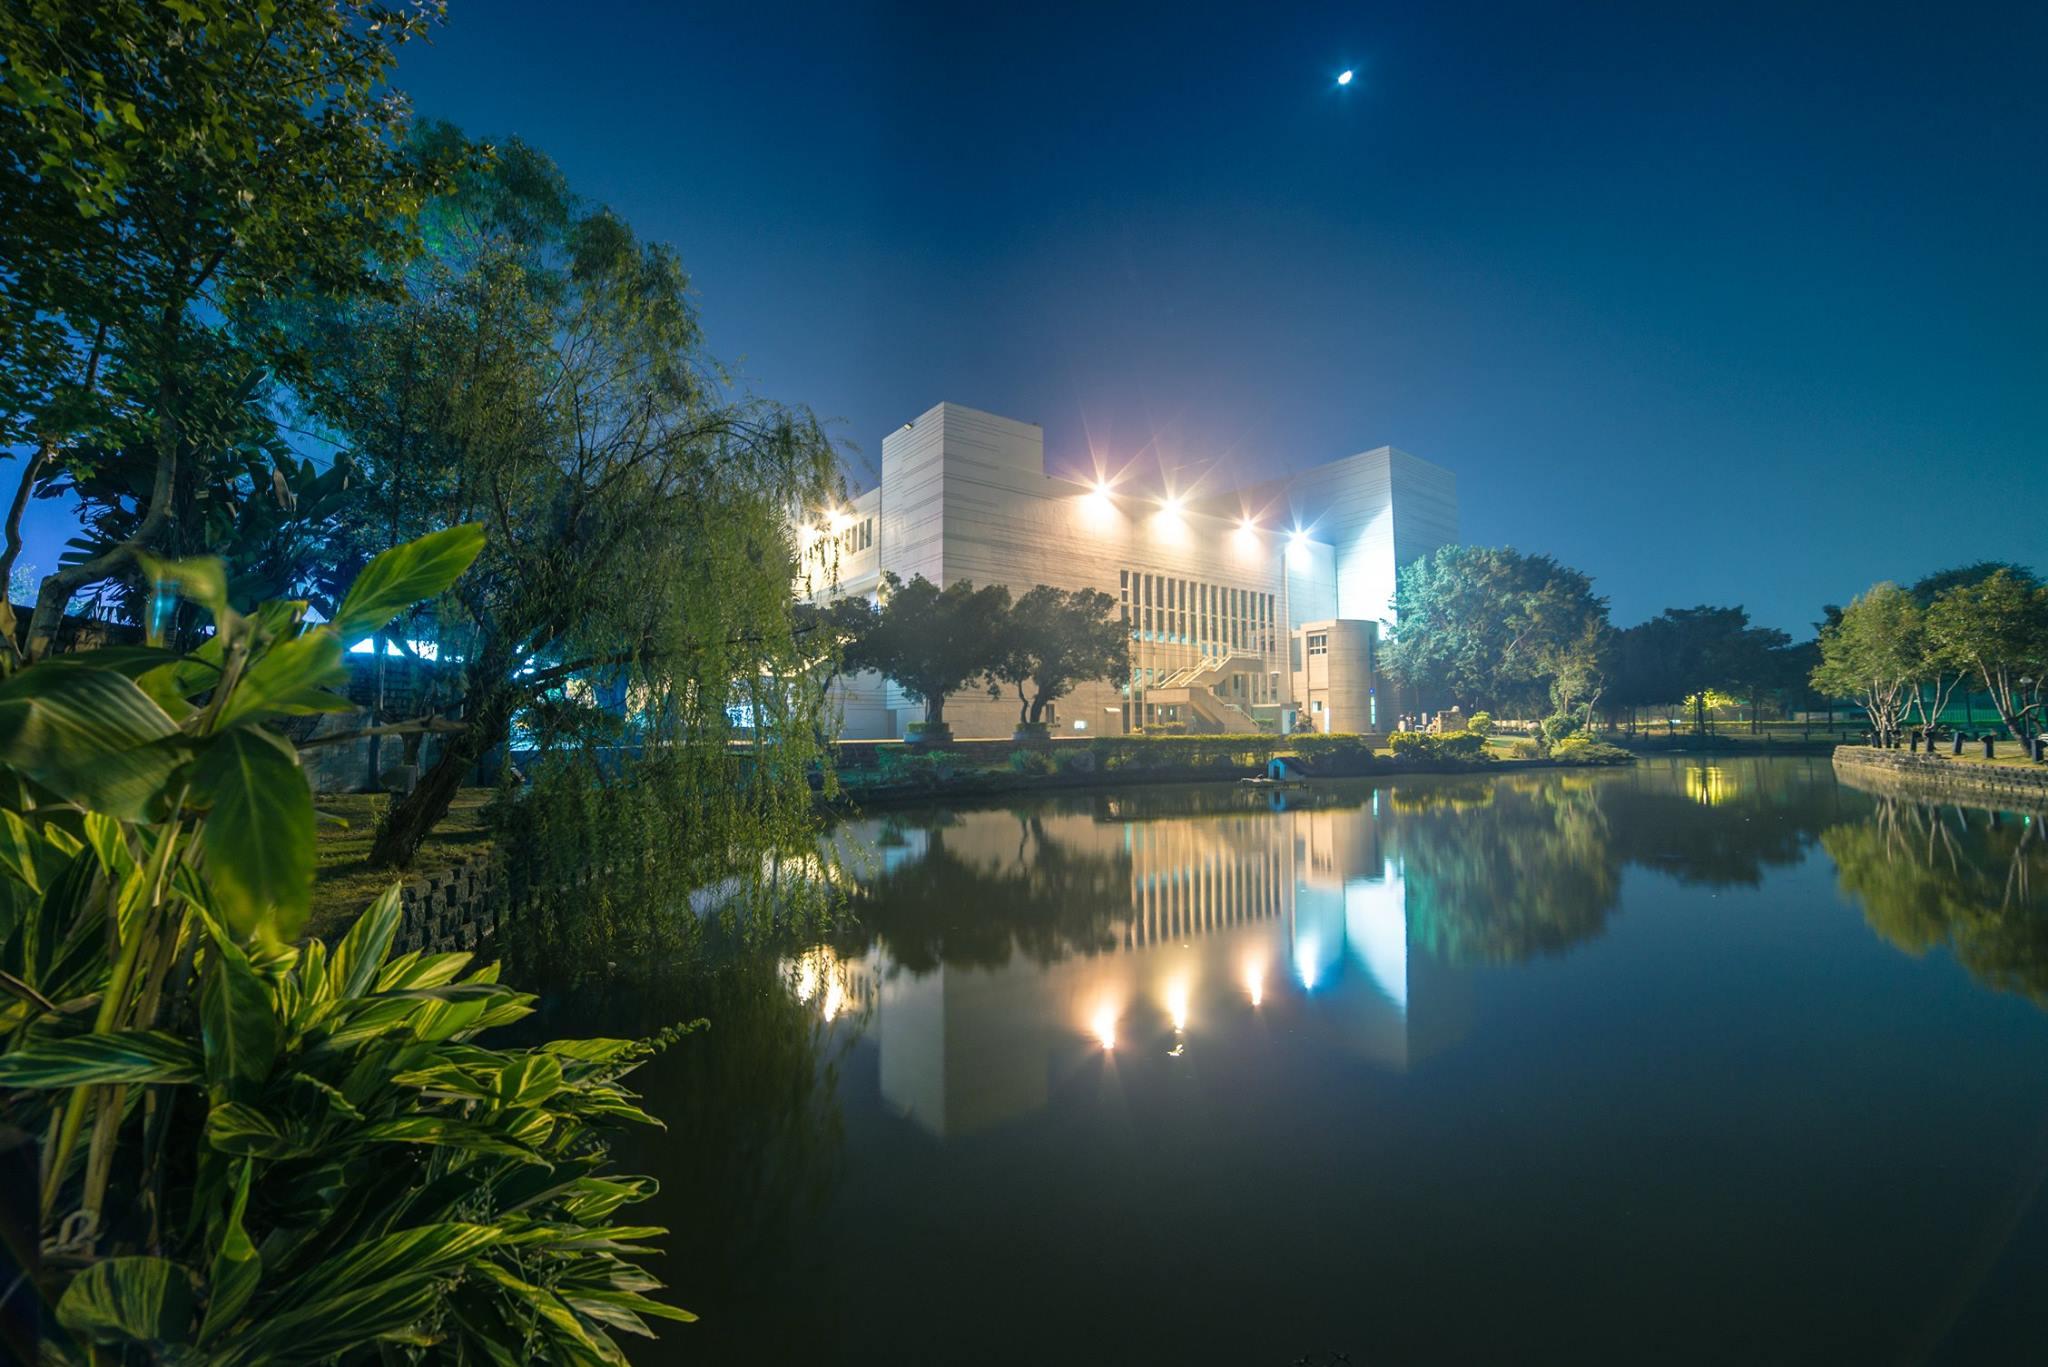 文化中心  Chiayi Cultural Center